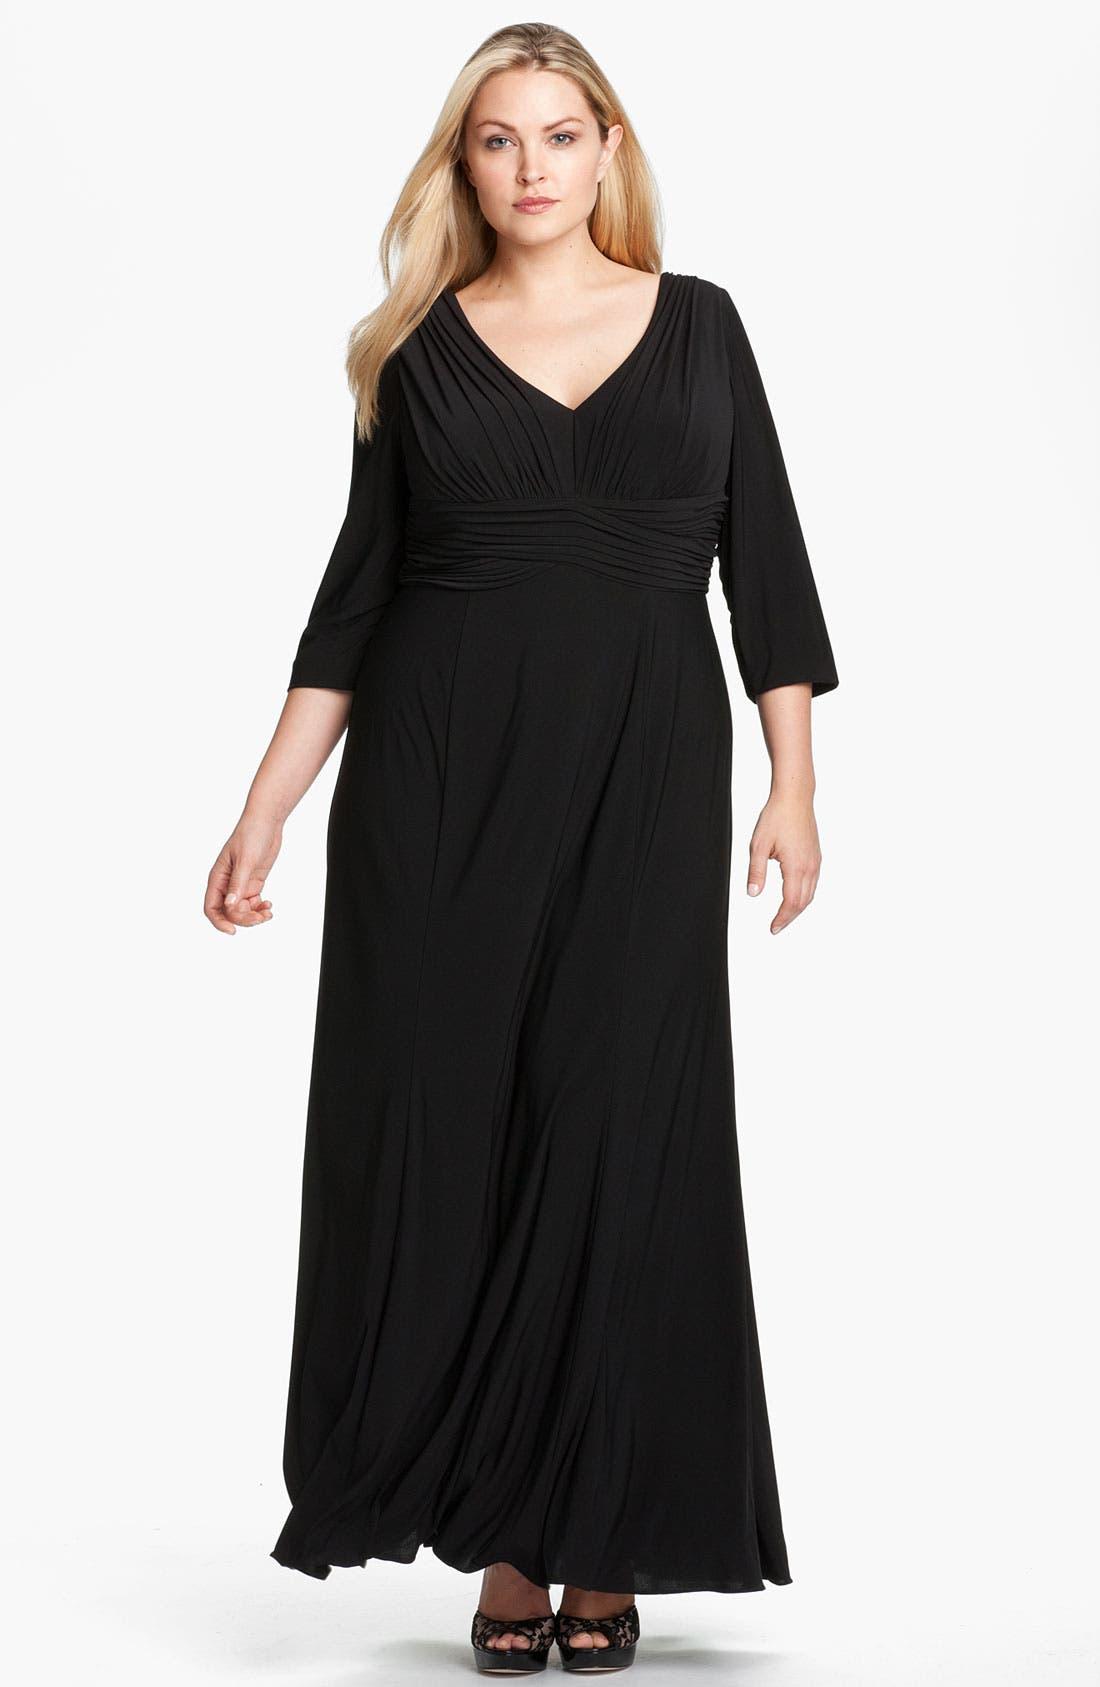 Alternate Image 1 Selected - Alex Evenings Pleated Jersey Dress (Plus)